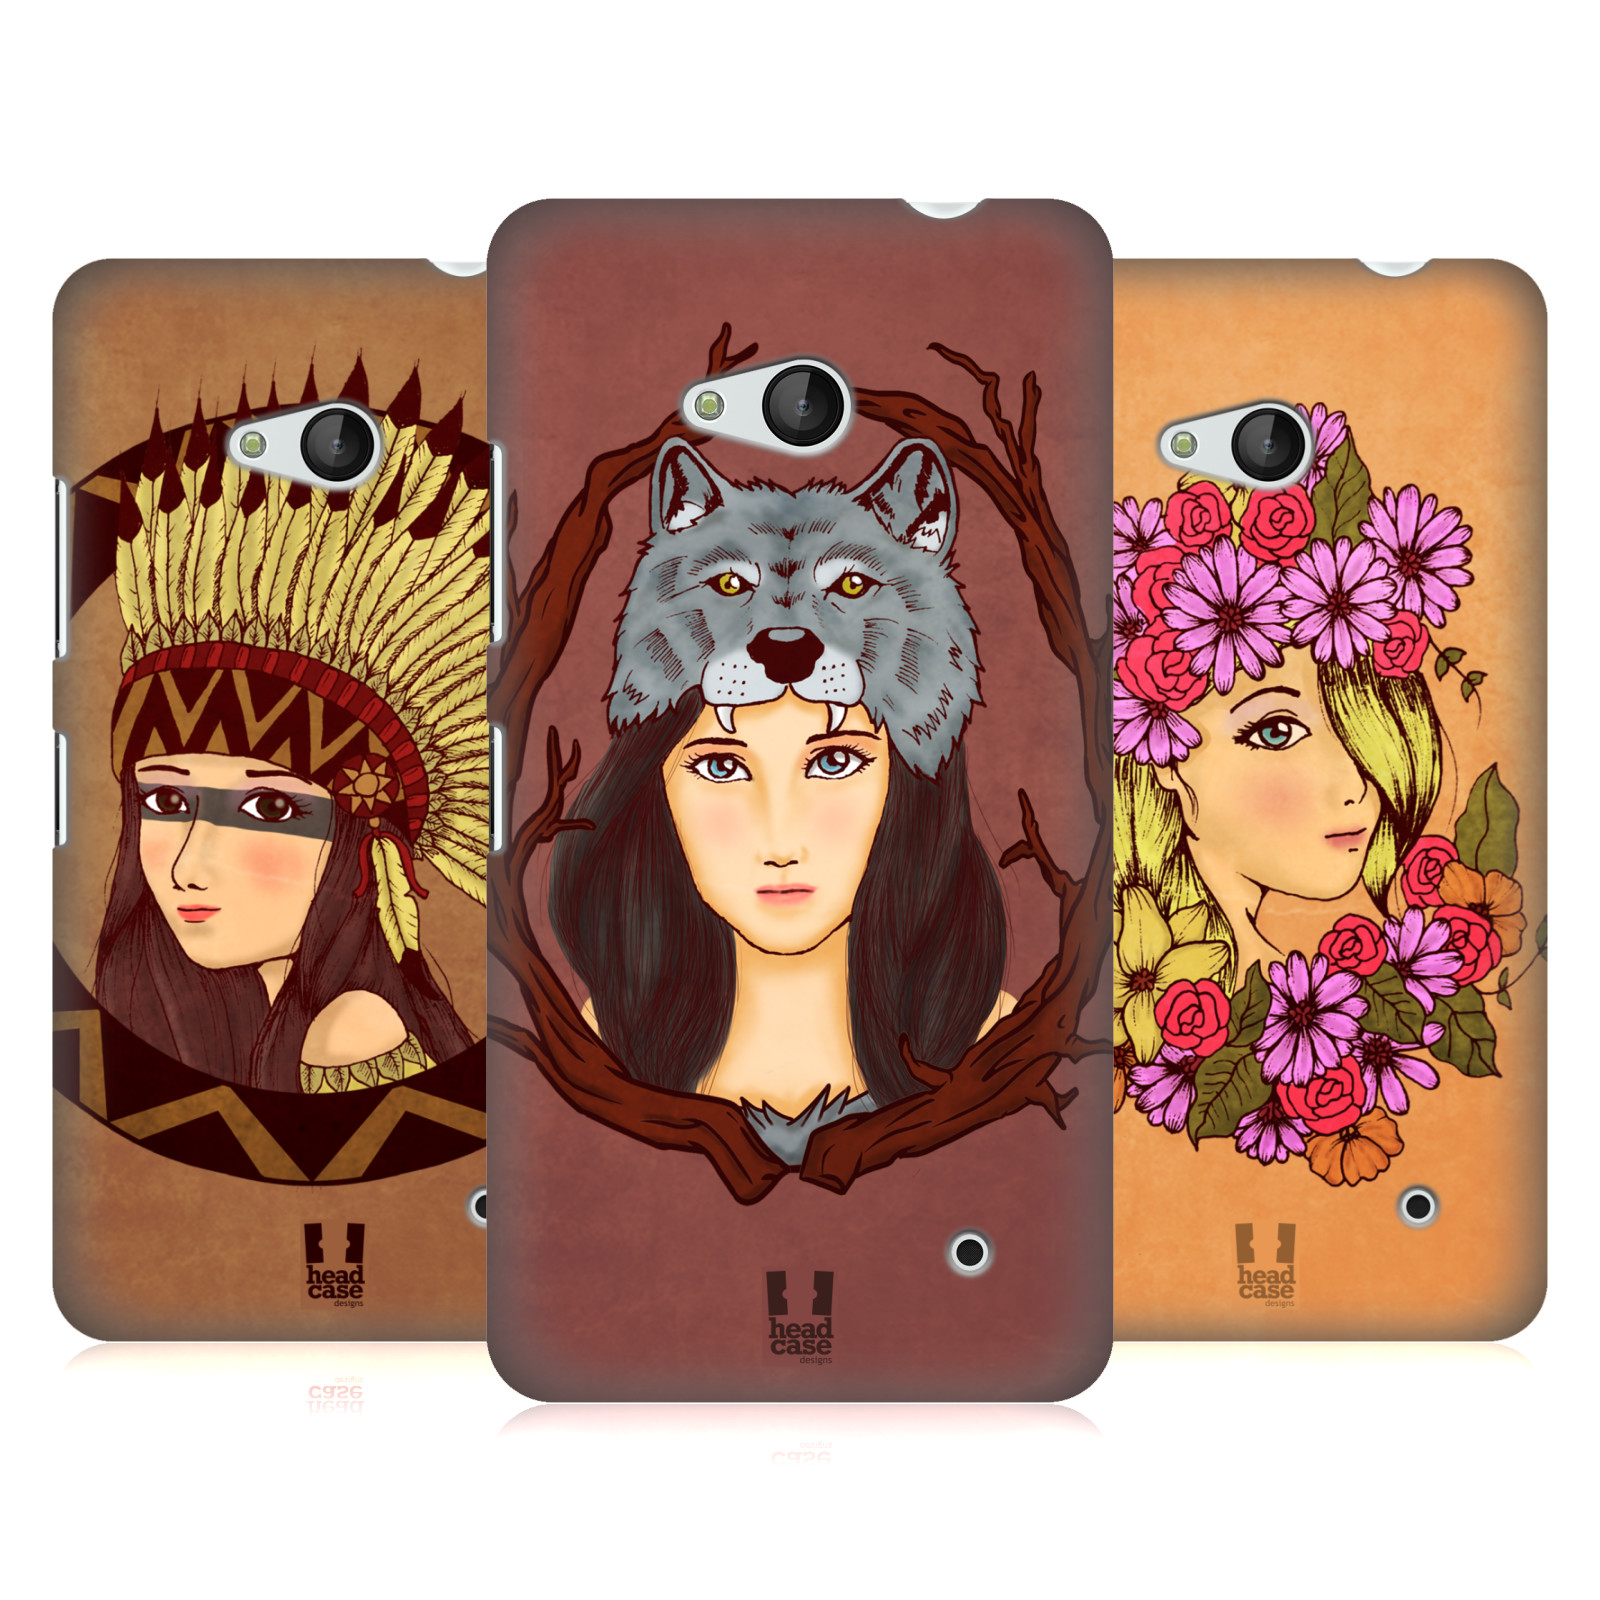 HEAD-CASE-DESIGNS-HEADDRESS-CHIC-HARD-BACK-CASE-FOR-MICROSOFT-PHONES